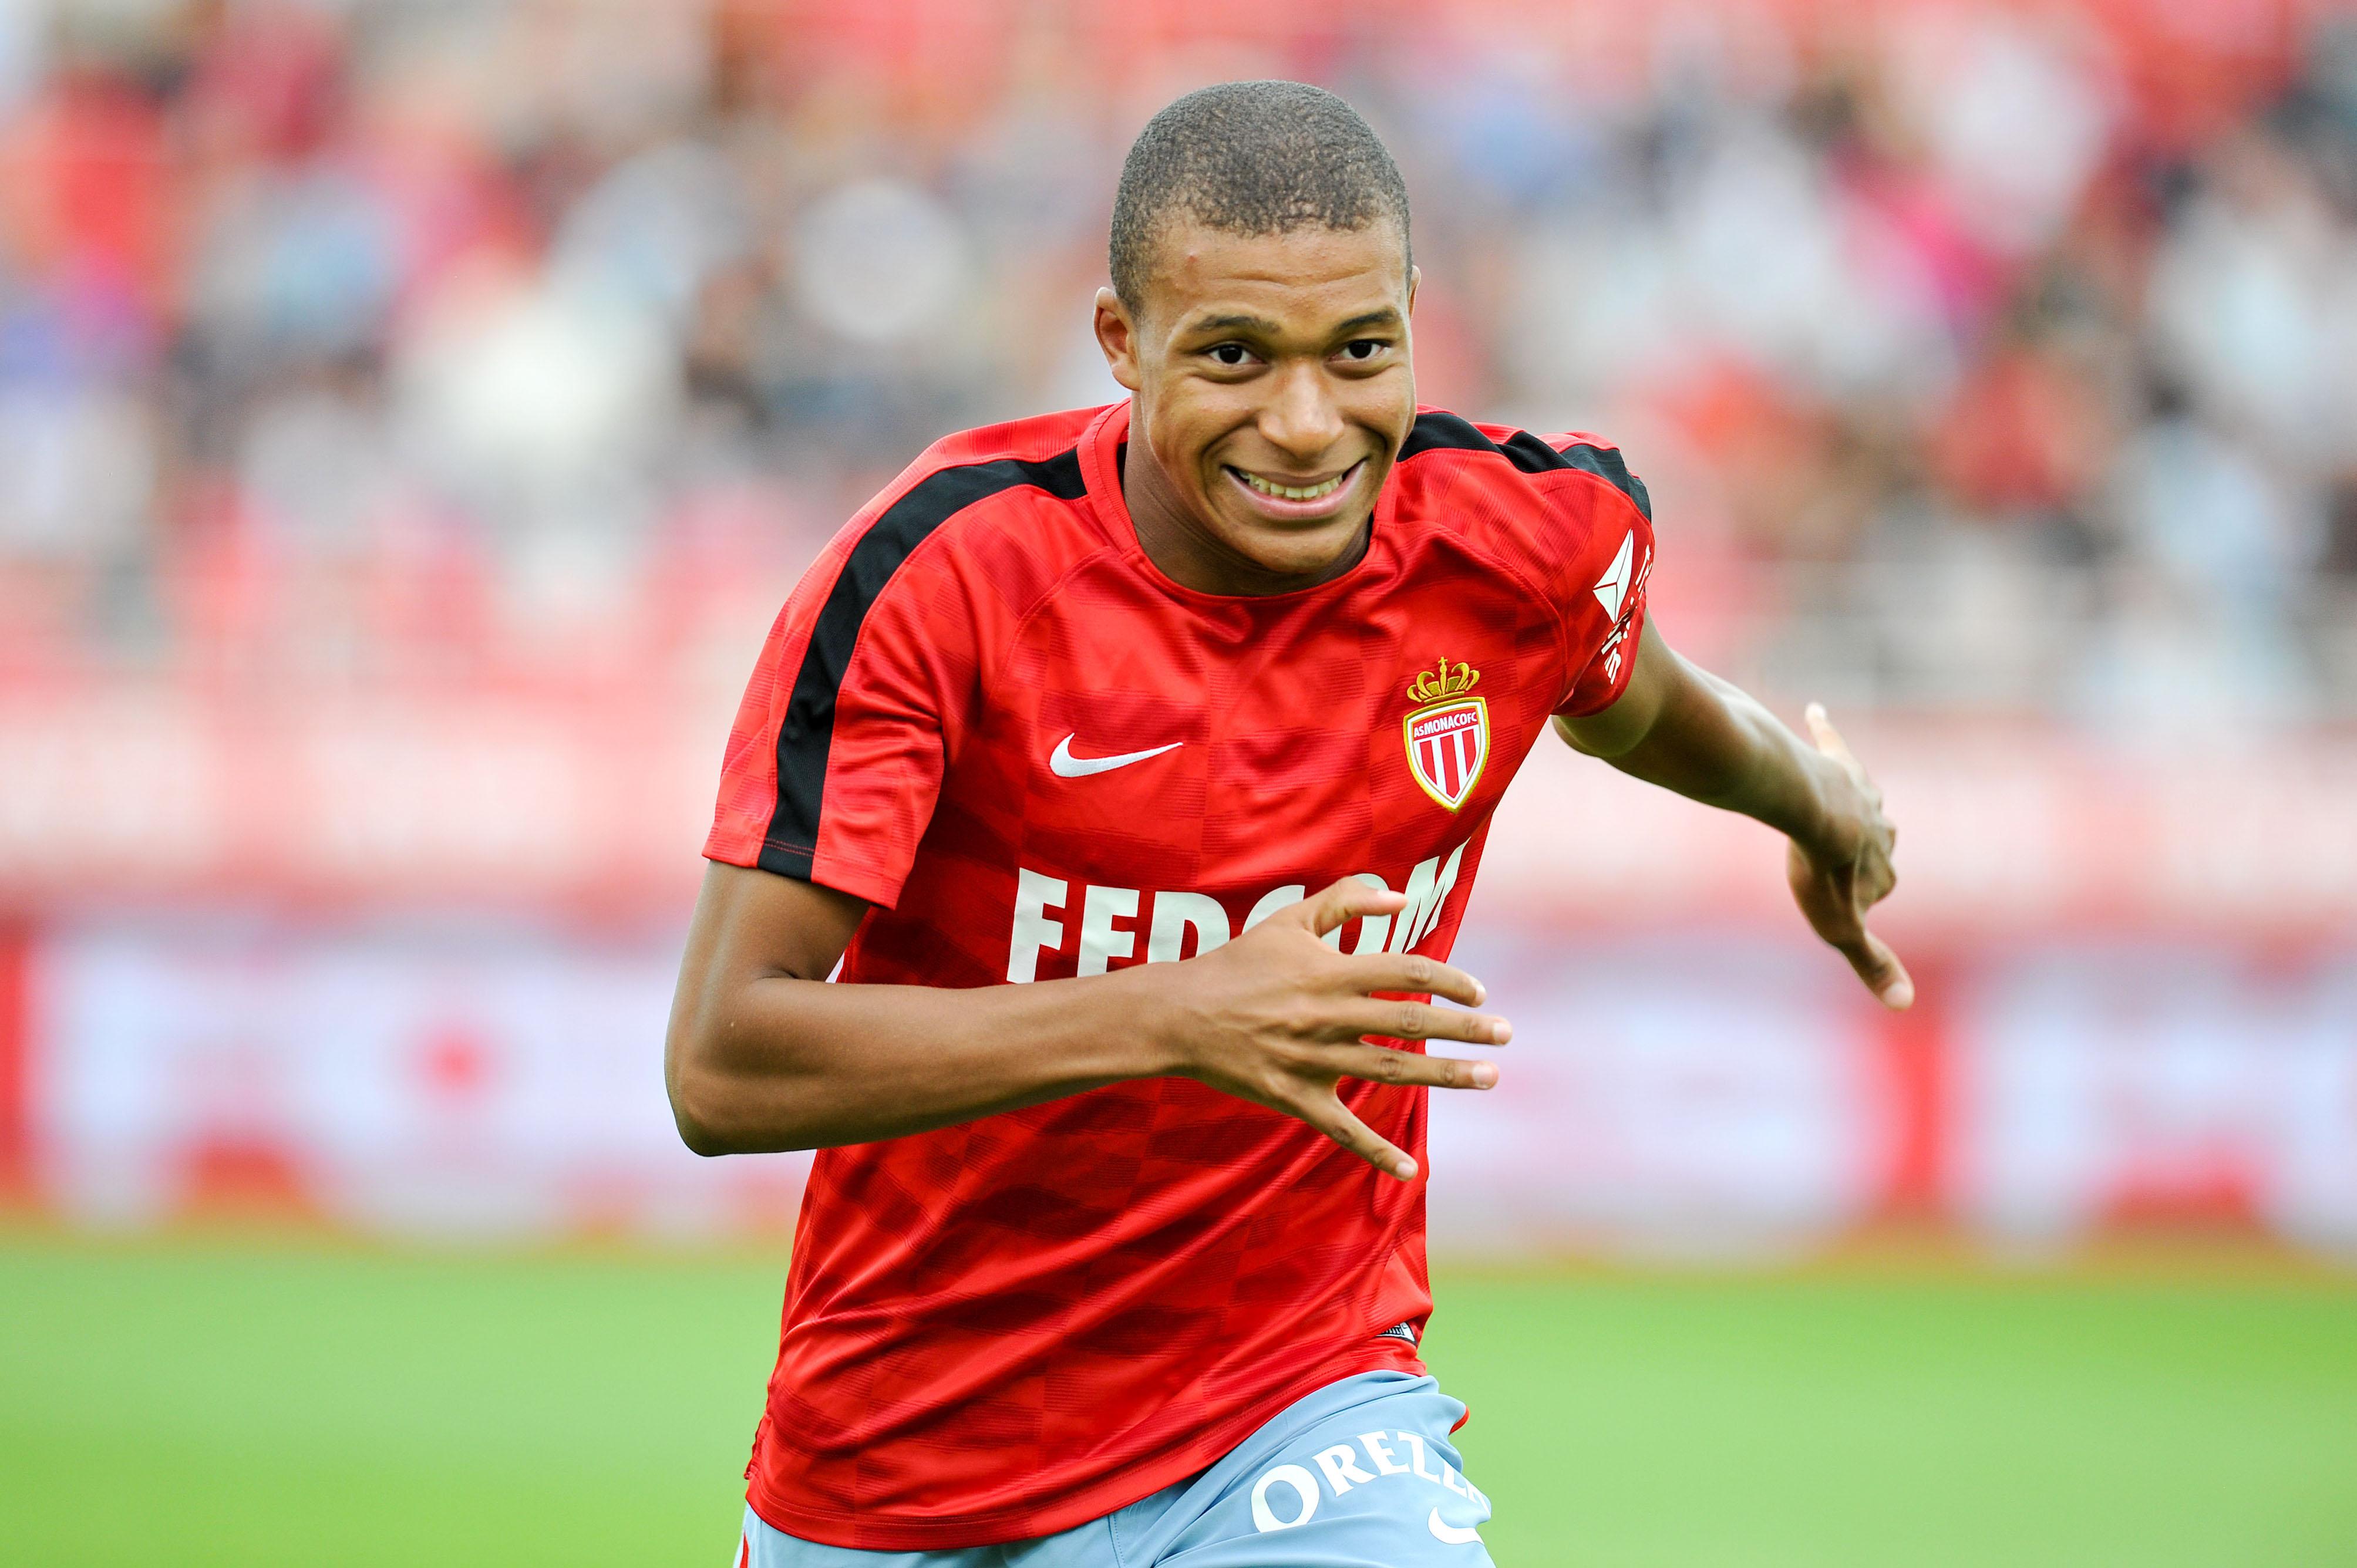 Football - Transferts - Les Ultras de Monaco s'en prennent à Kylian Mbappé